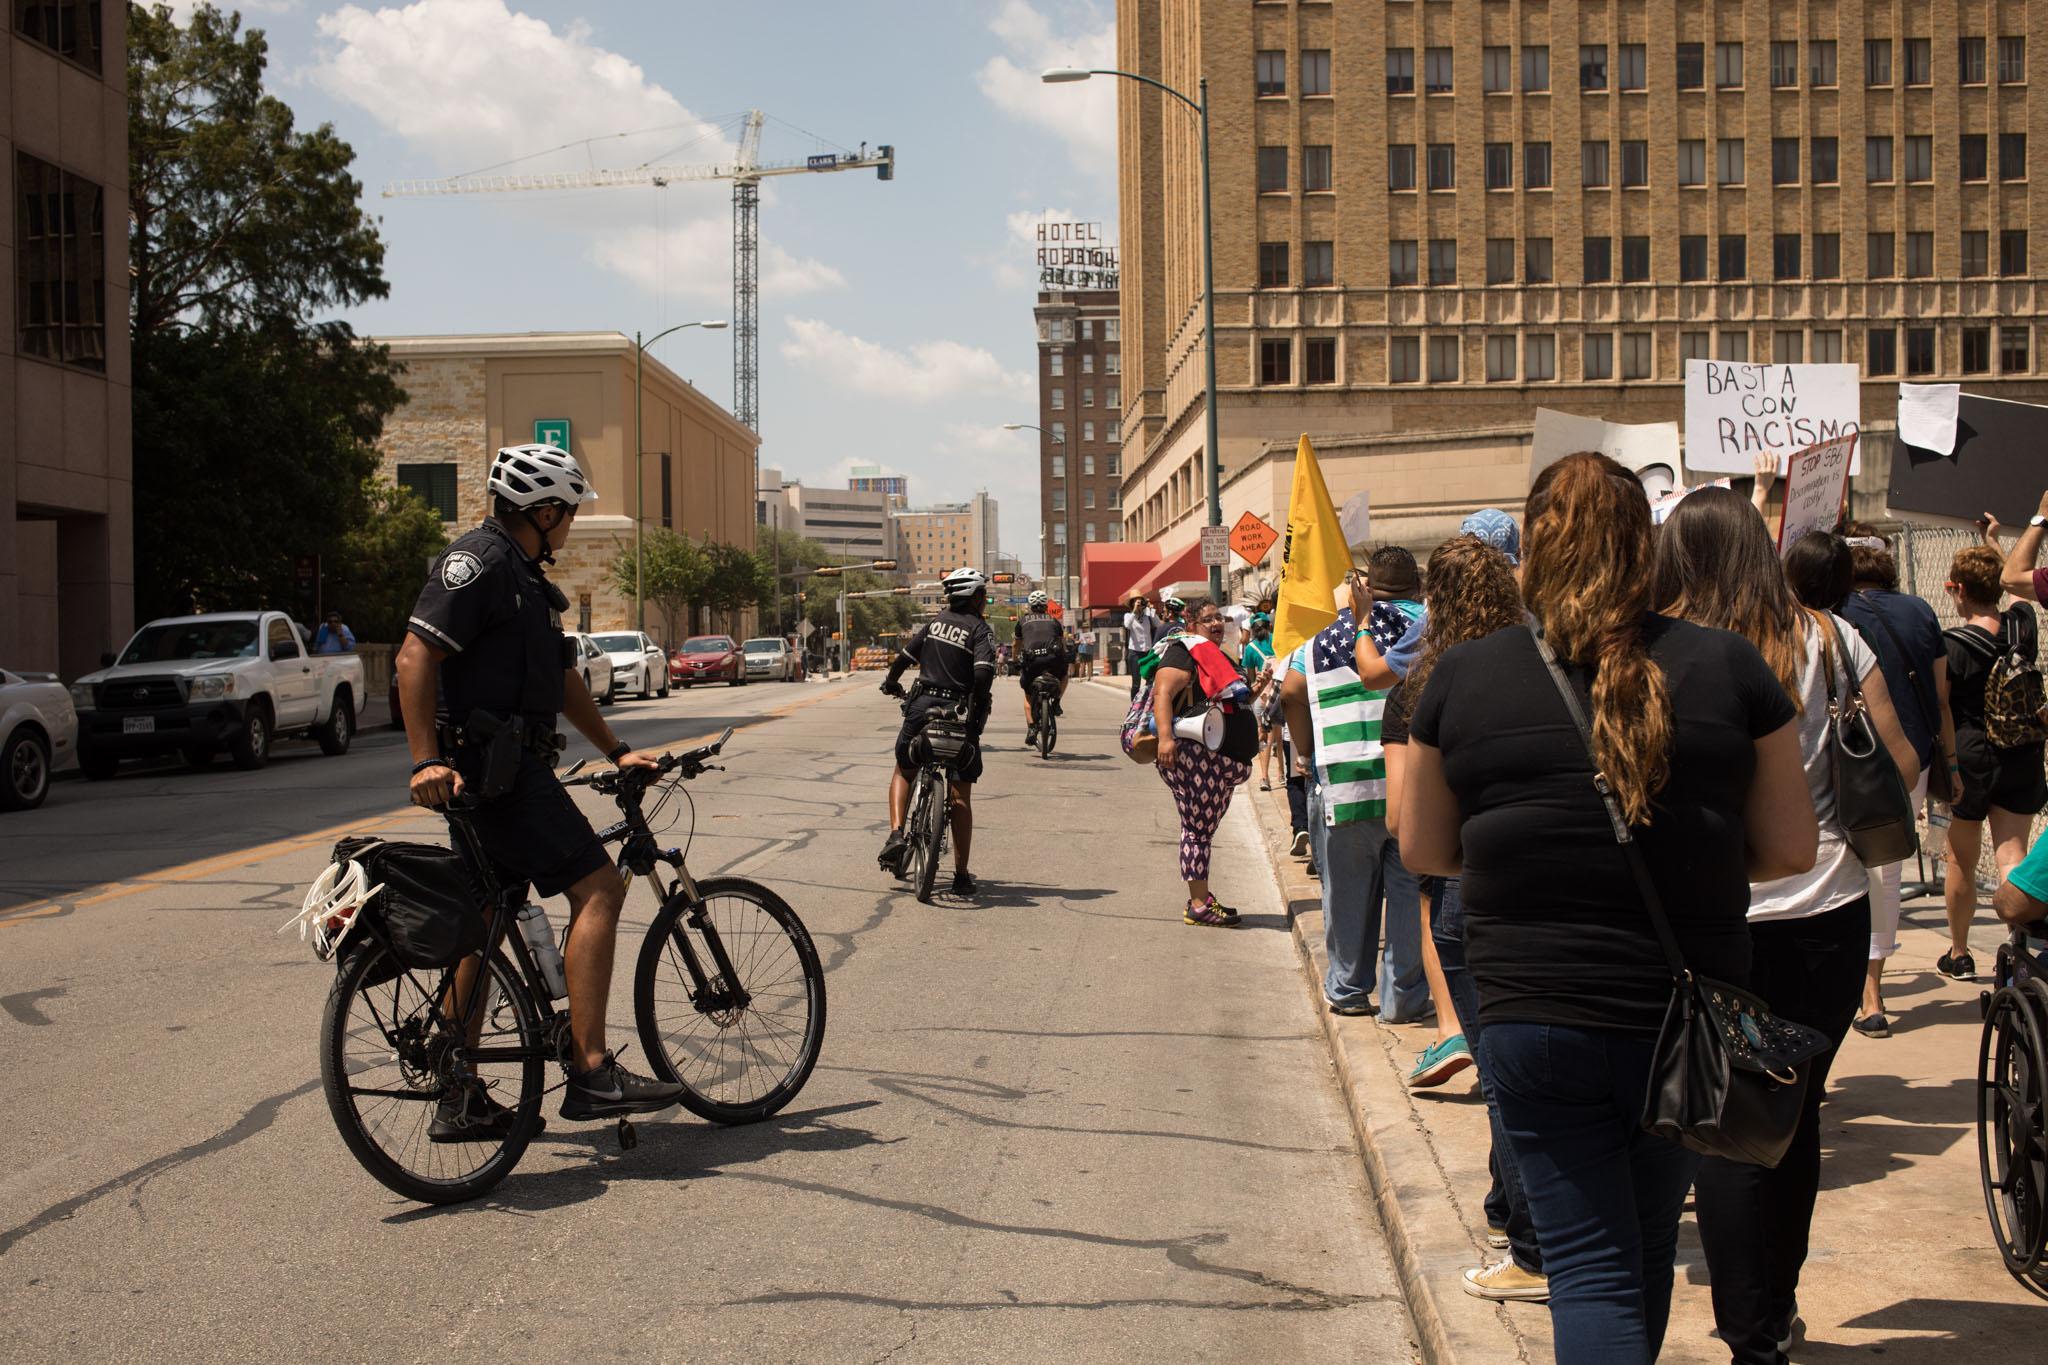 Police help protestors against SB4 stay safe on the sidewalk.